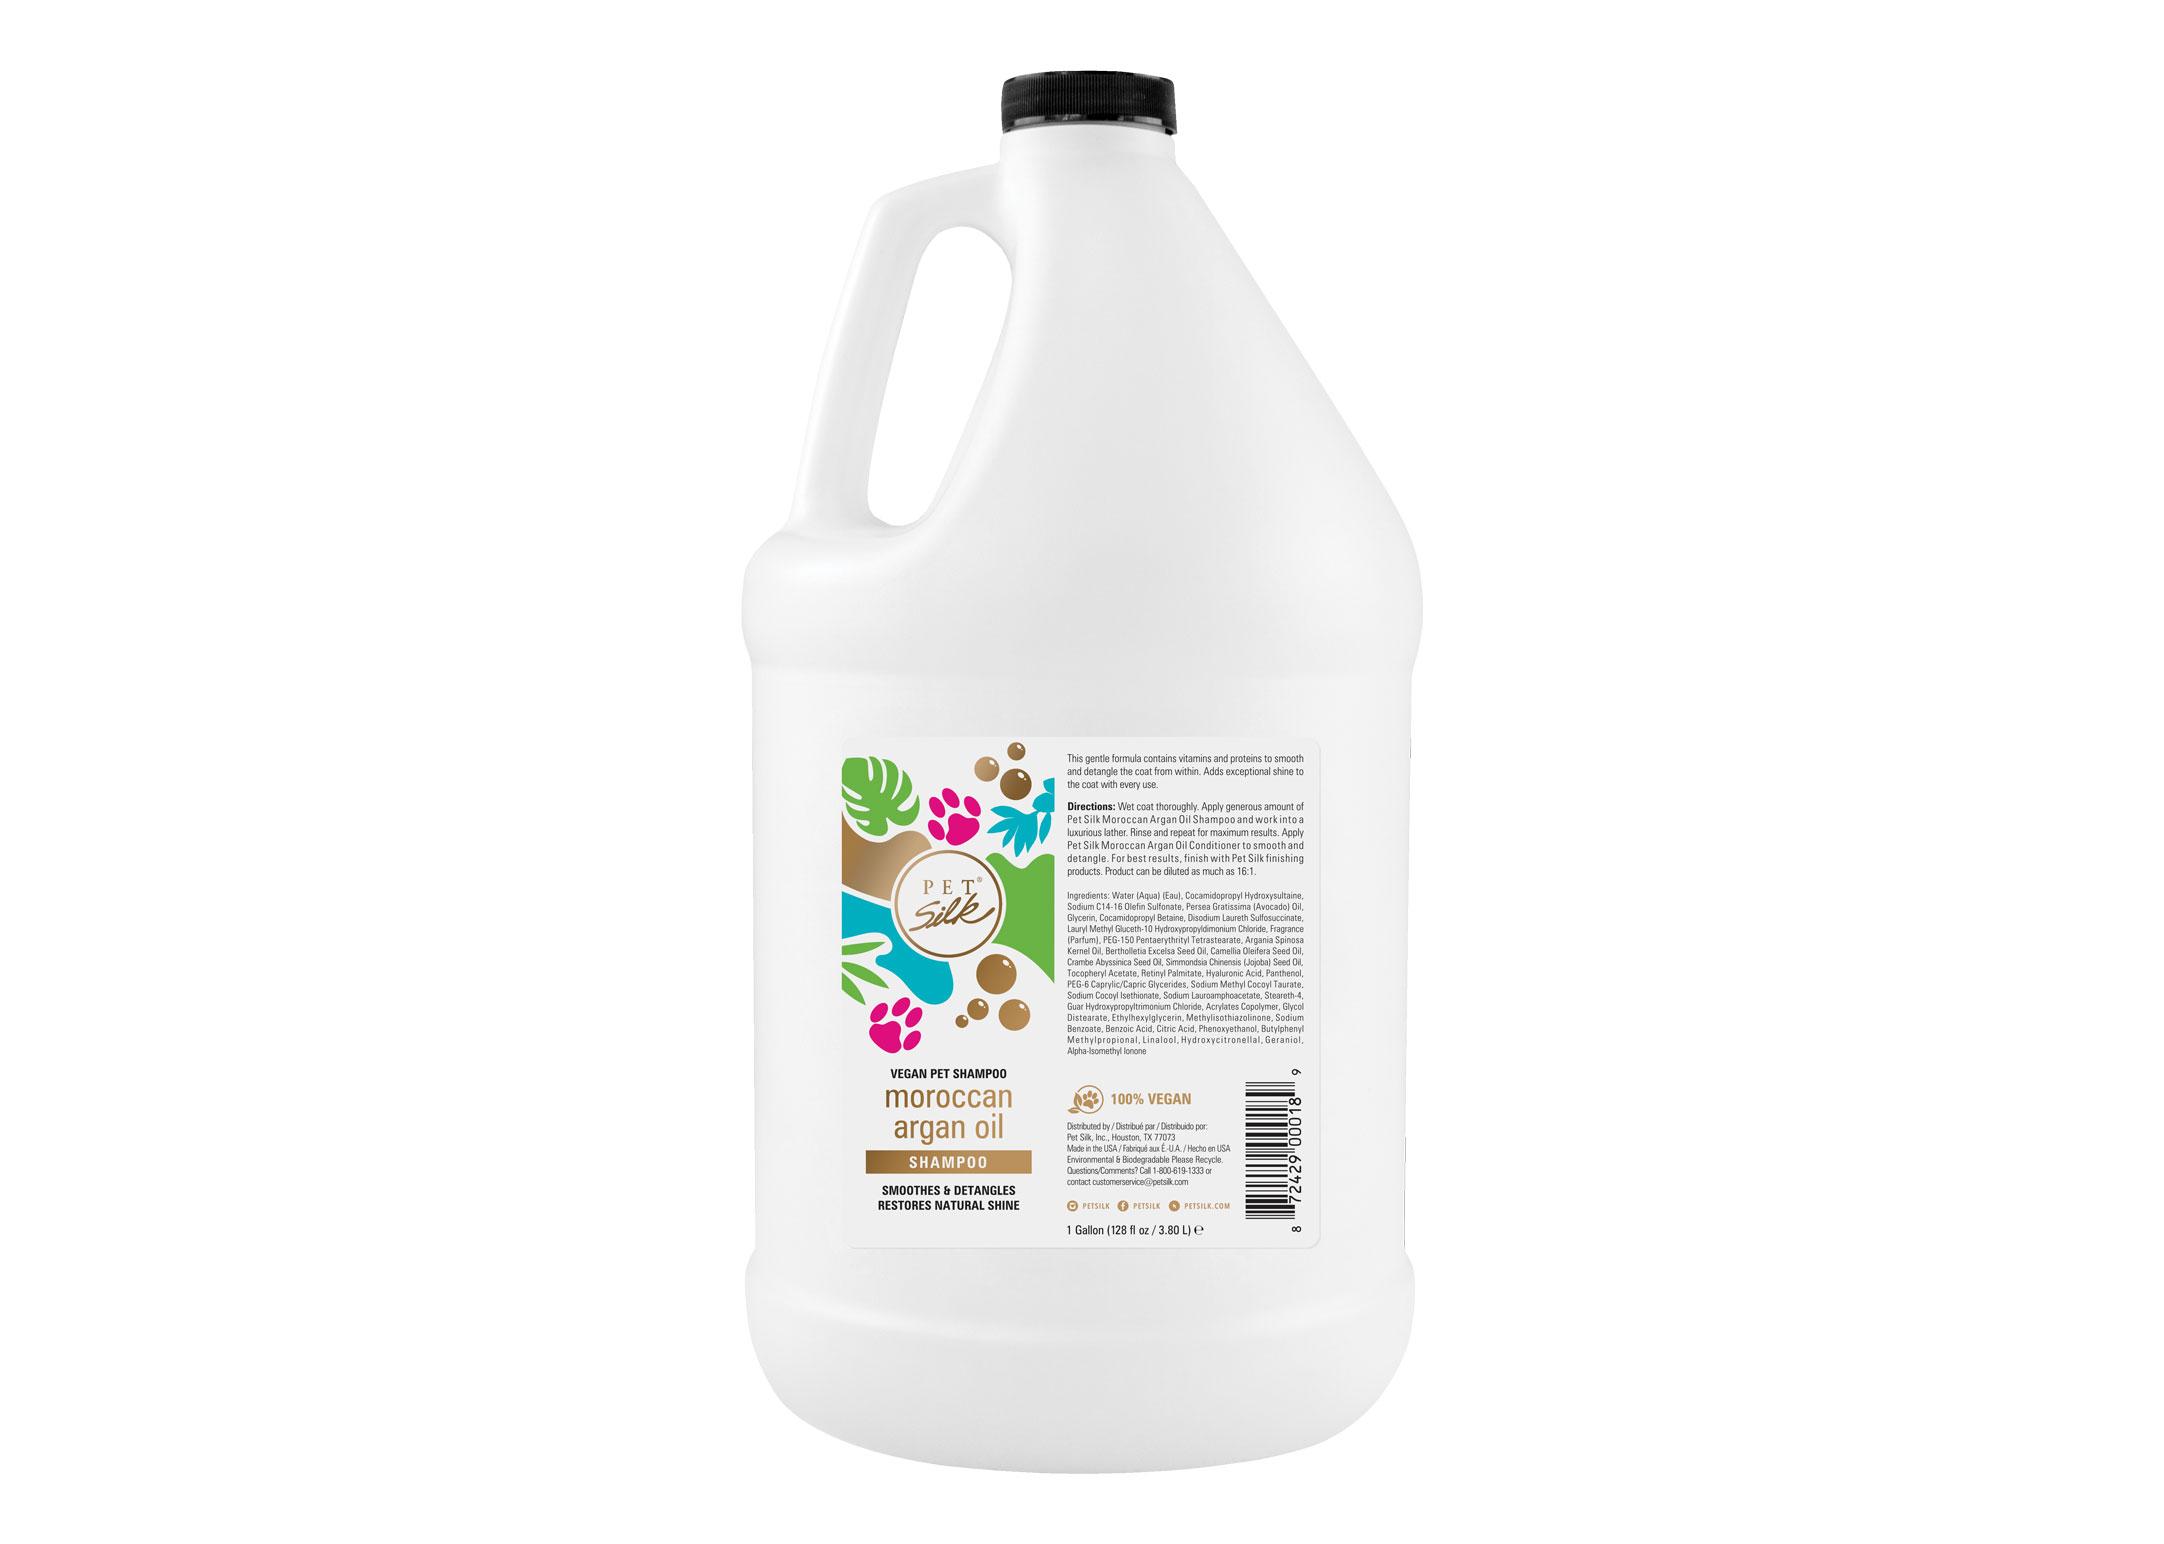 Pet Silk Vegan Moroccan Argan Oil 3,8 L Shampoo